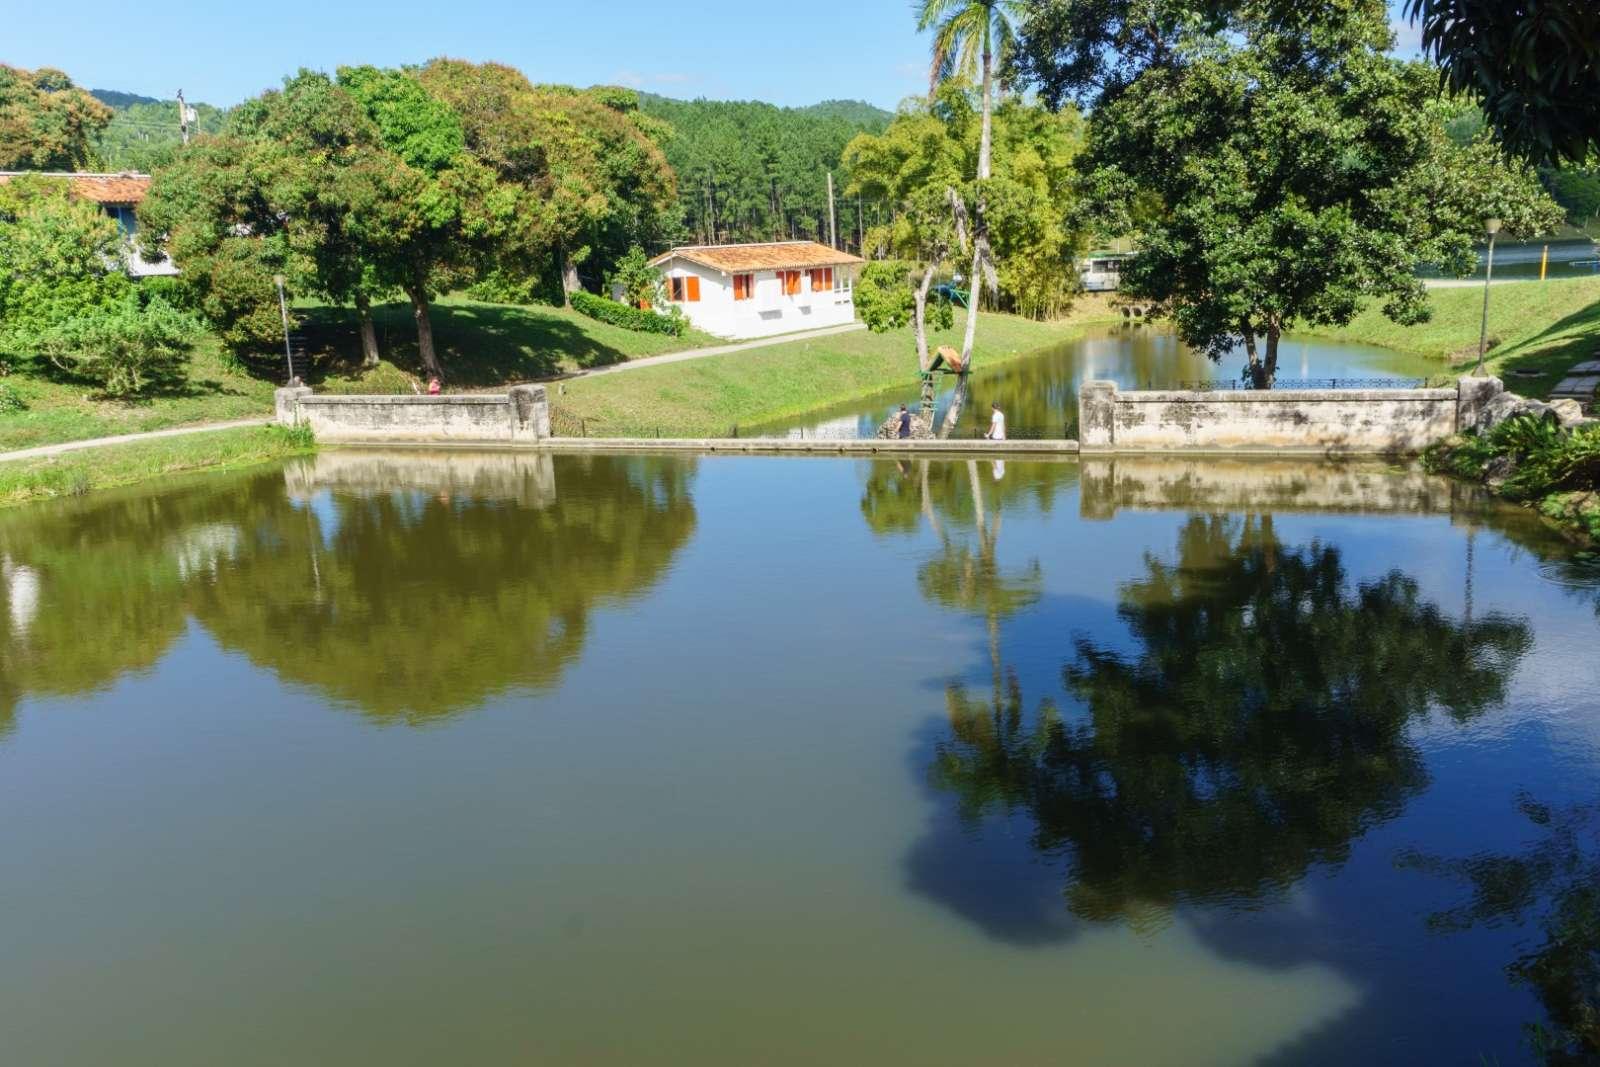 System of lakes at Las Terrazas, Cuba